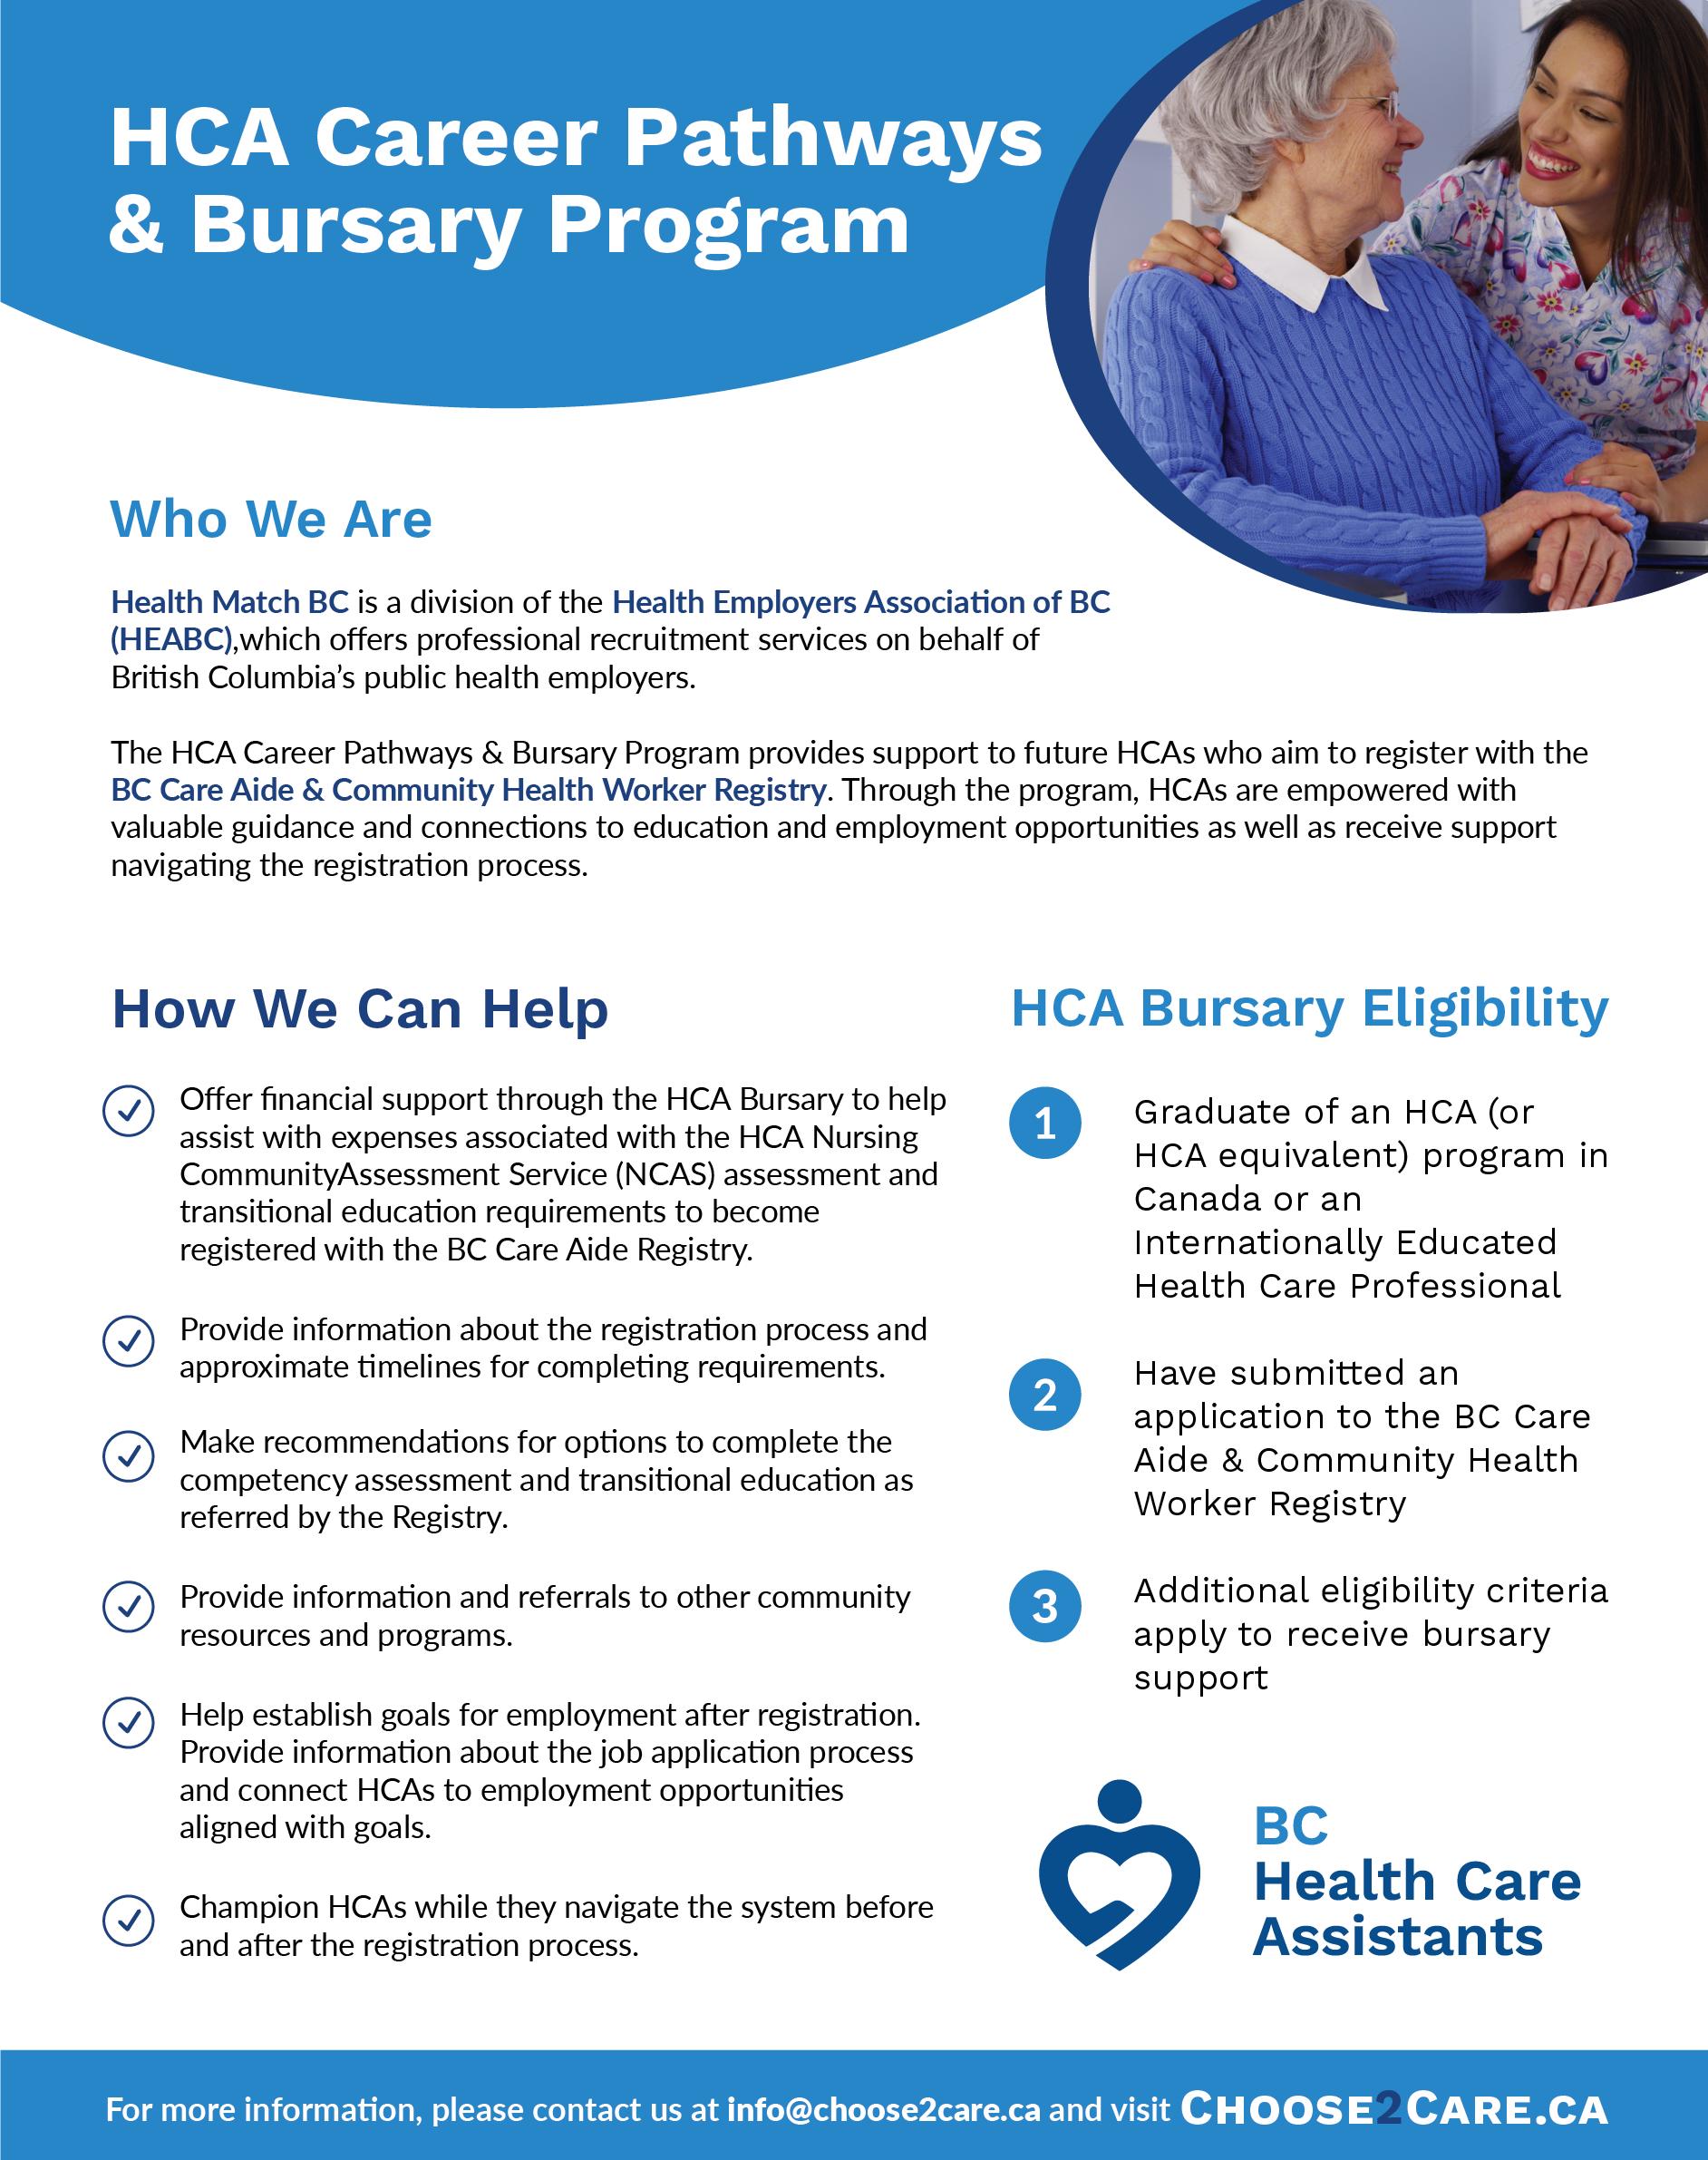 Infosheet - HCA Career Pathways & Bursary Program